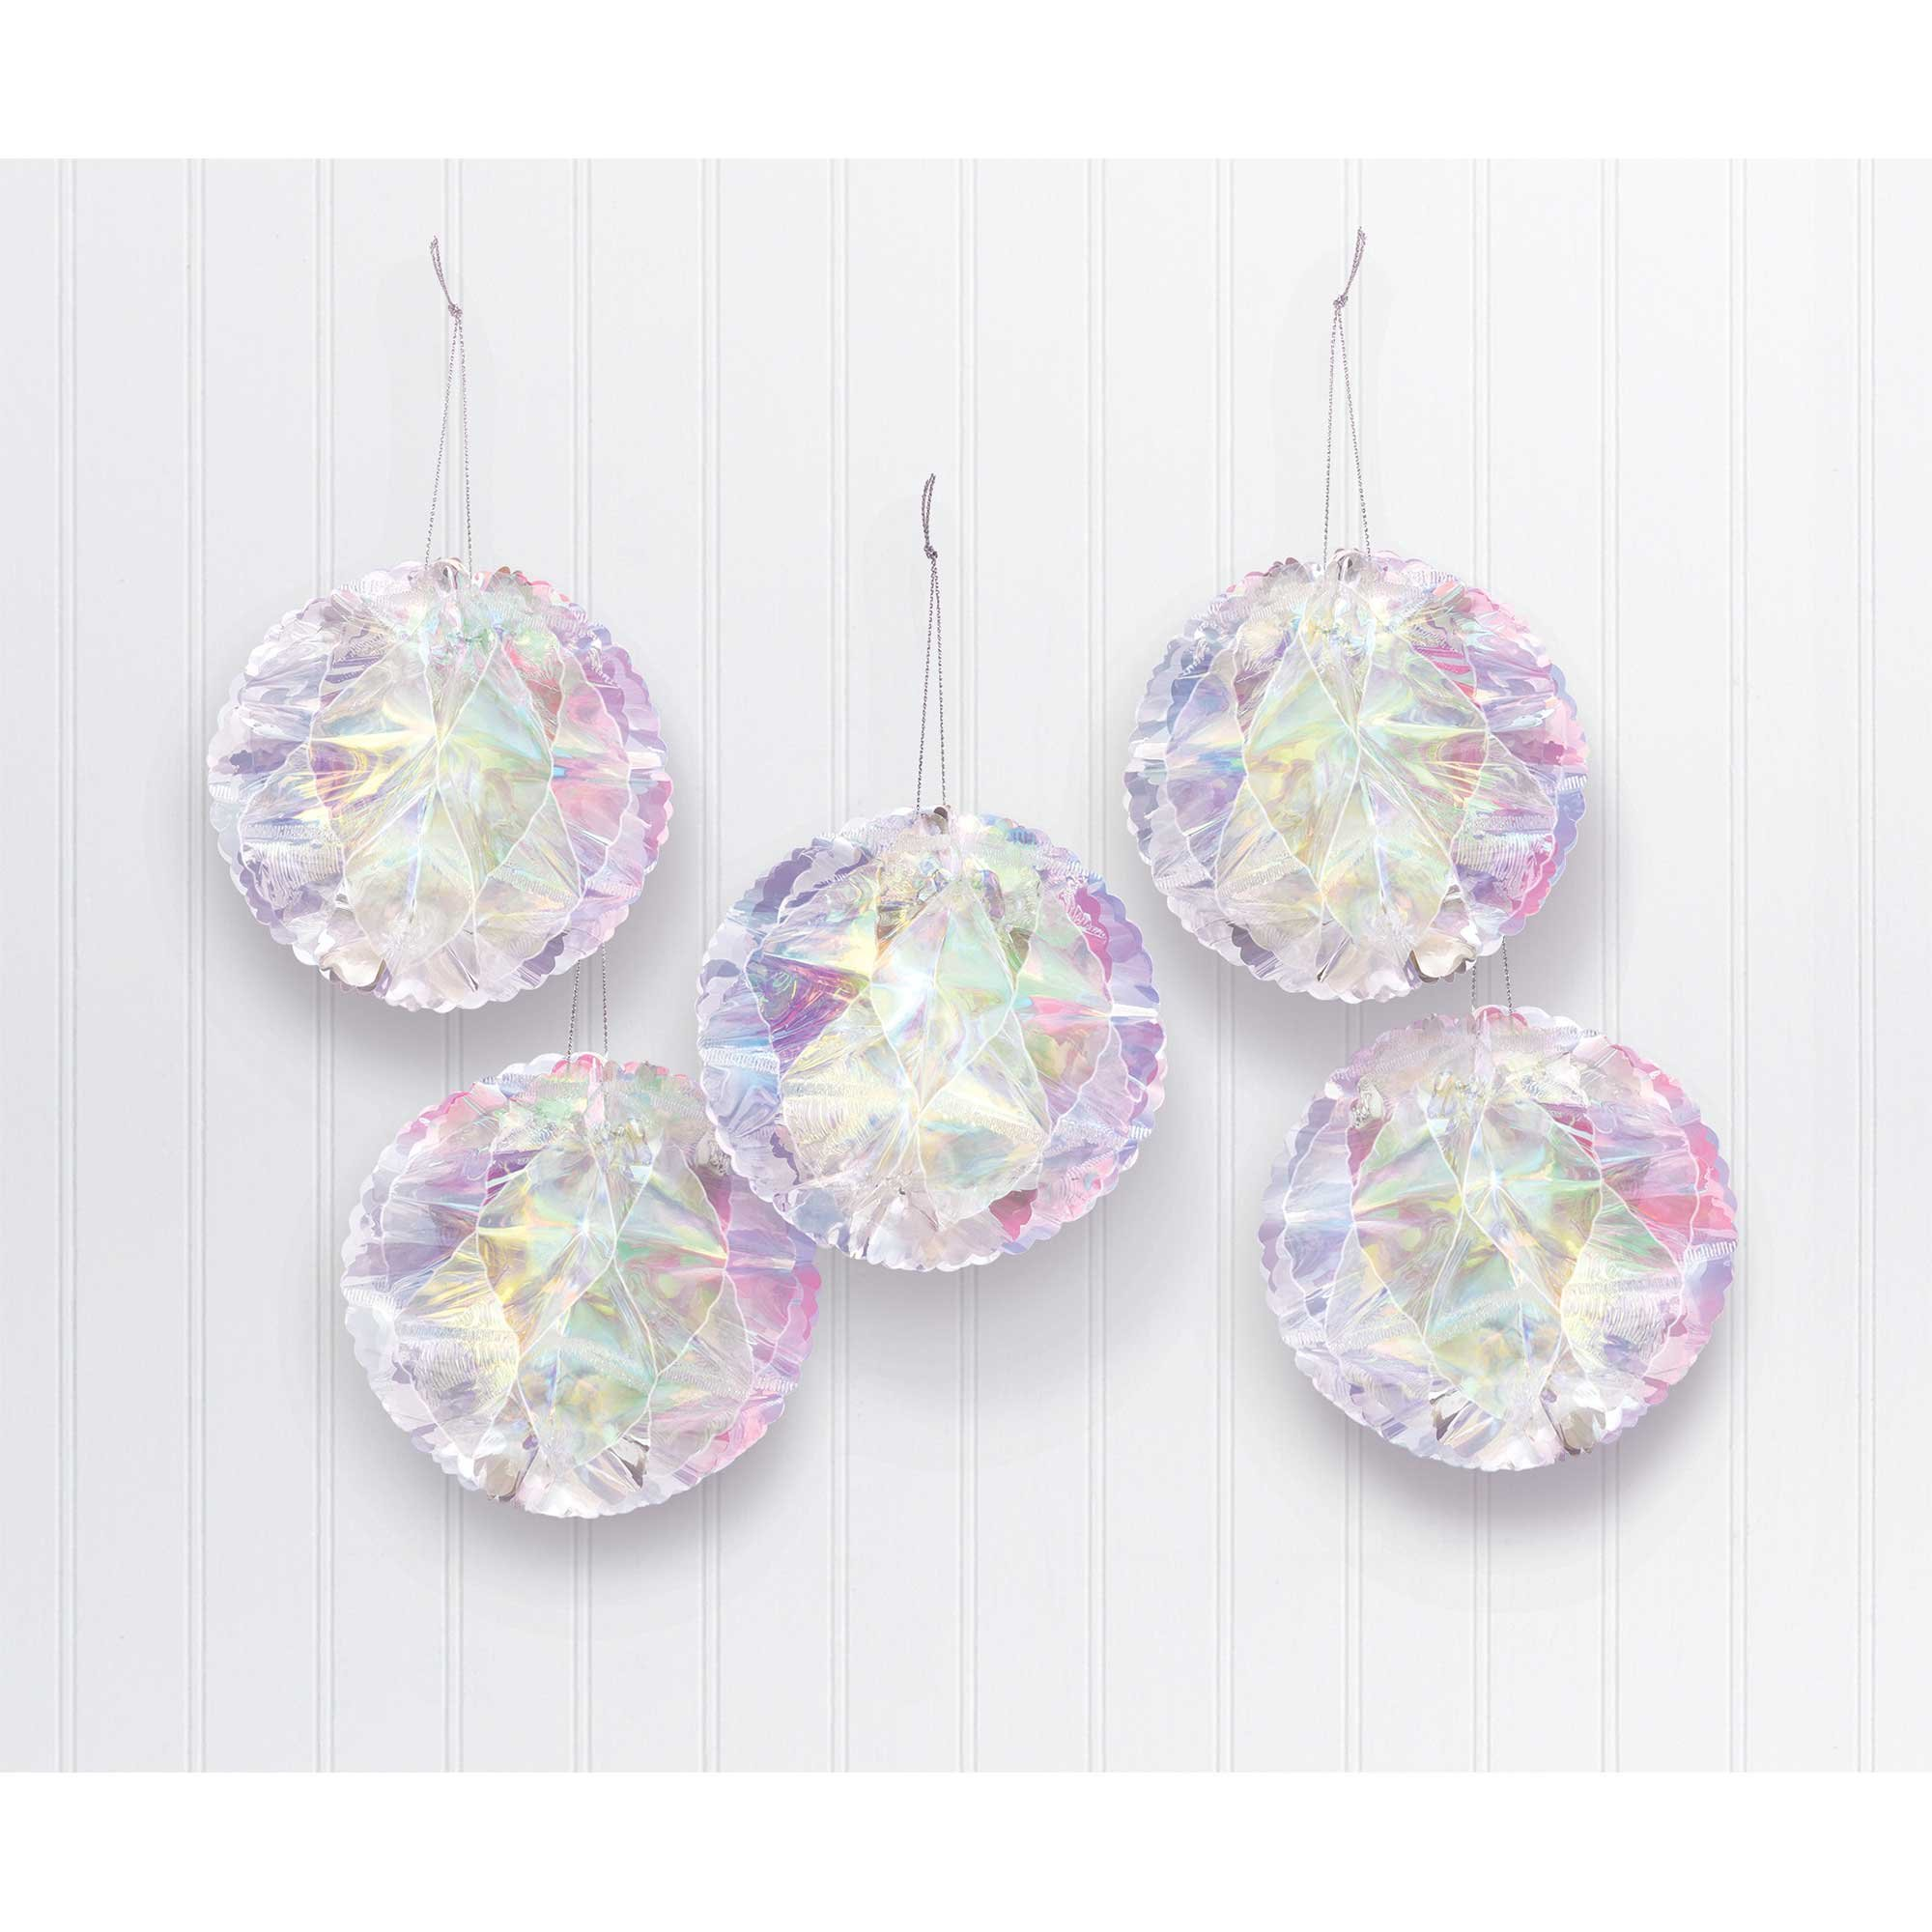 Luminous Birthday Iridescent Foil Honeycomb Balls Hanging Decorations